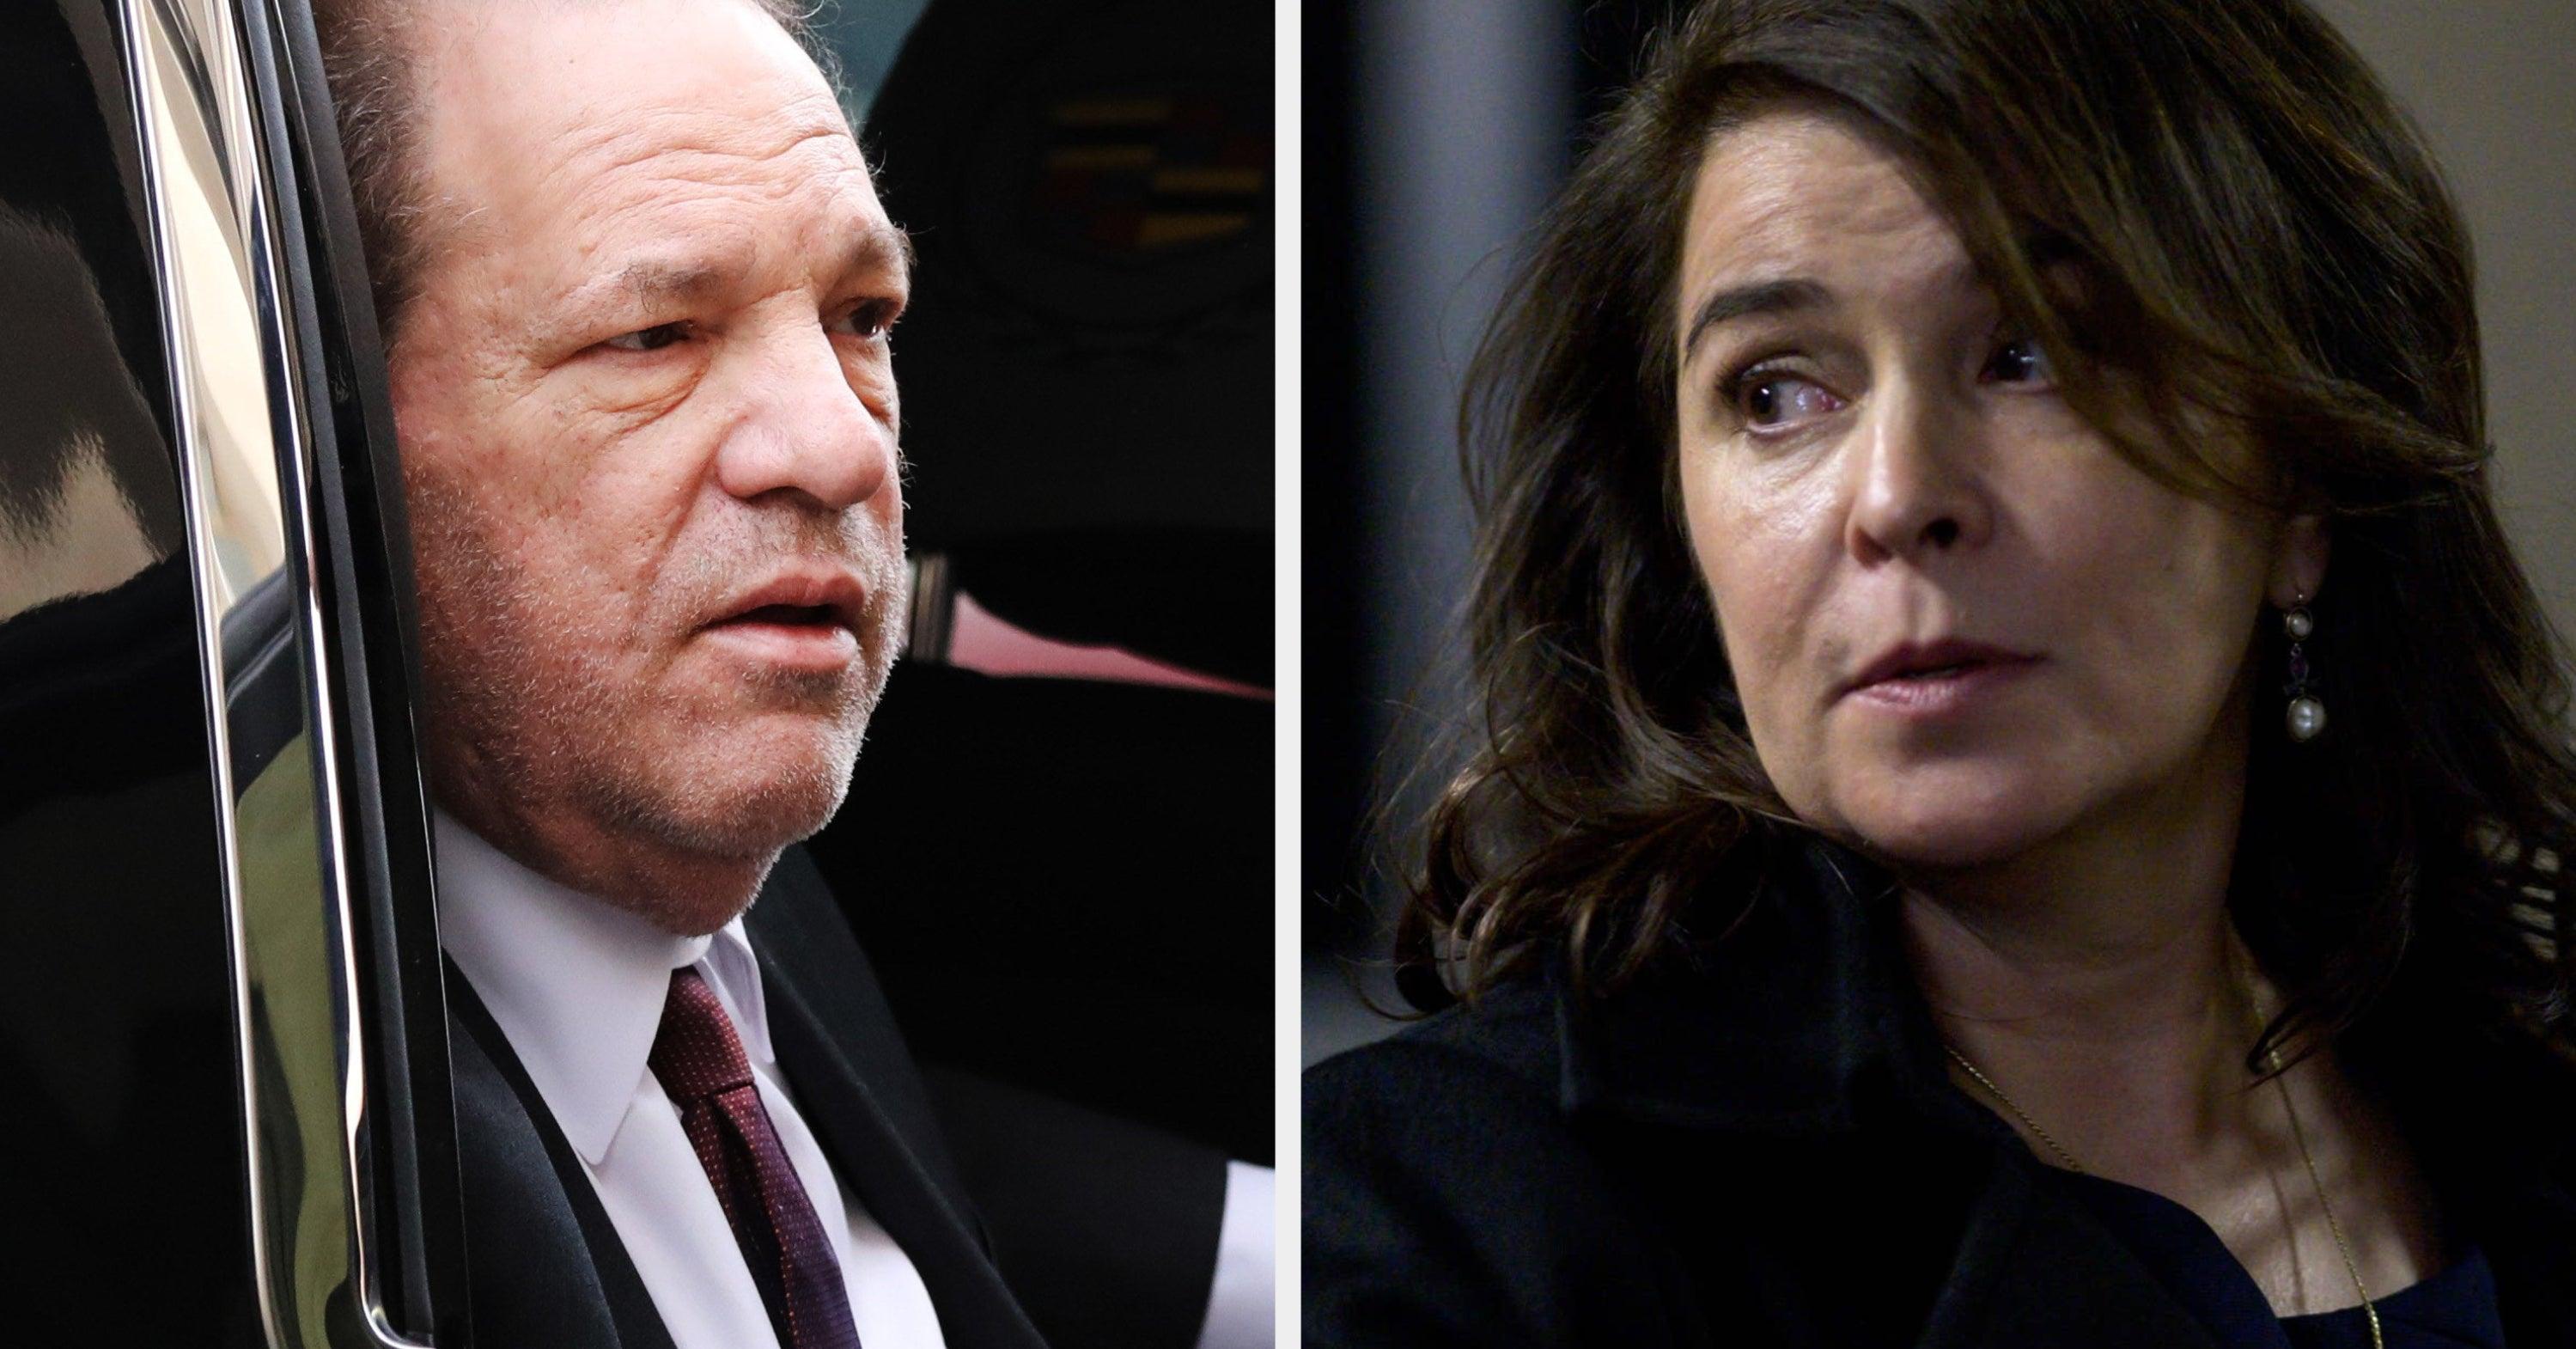 The Harvey Weinstein Jurors Asked To Rehear Key Testimonies Involving Annabella Sciorra's Rape Allegation